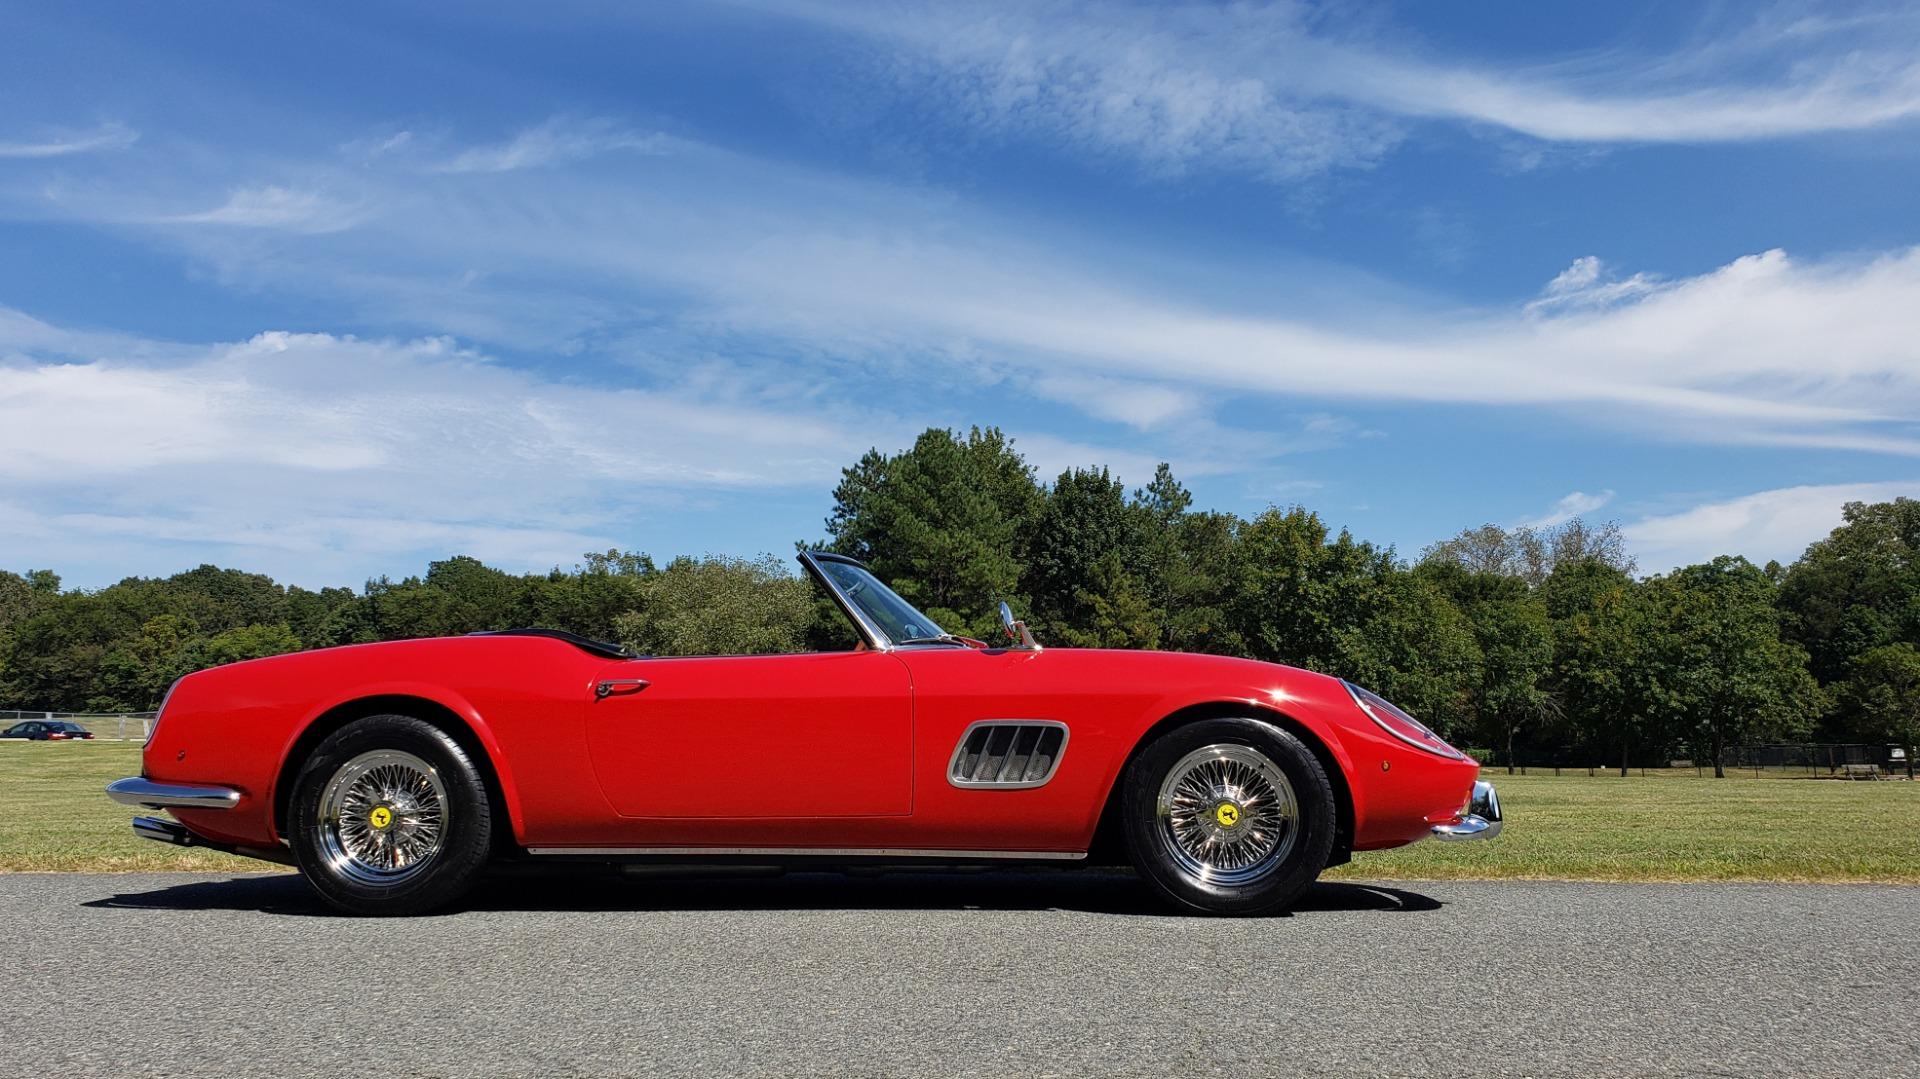 Used 1961 Ferrari 250GT SWB CALIFORNIA REPLICA / 302CI V8 / TREMEC 5-SPEED for sale Sold at Formula Imports in Charlotte NC 28227 25